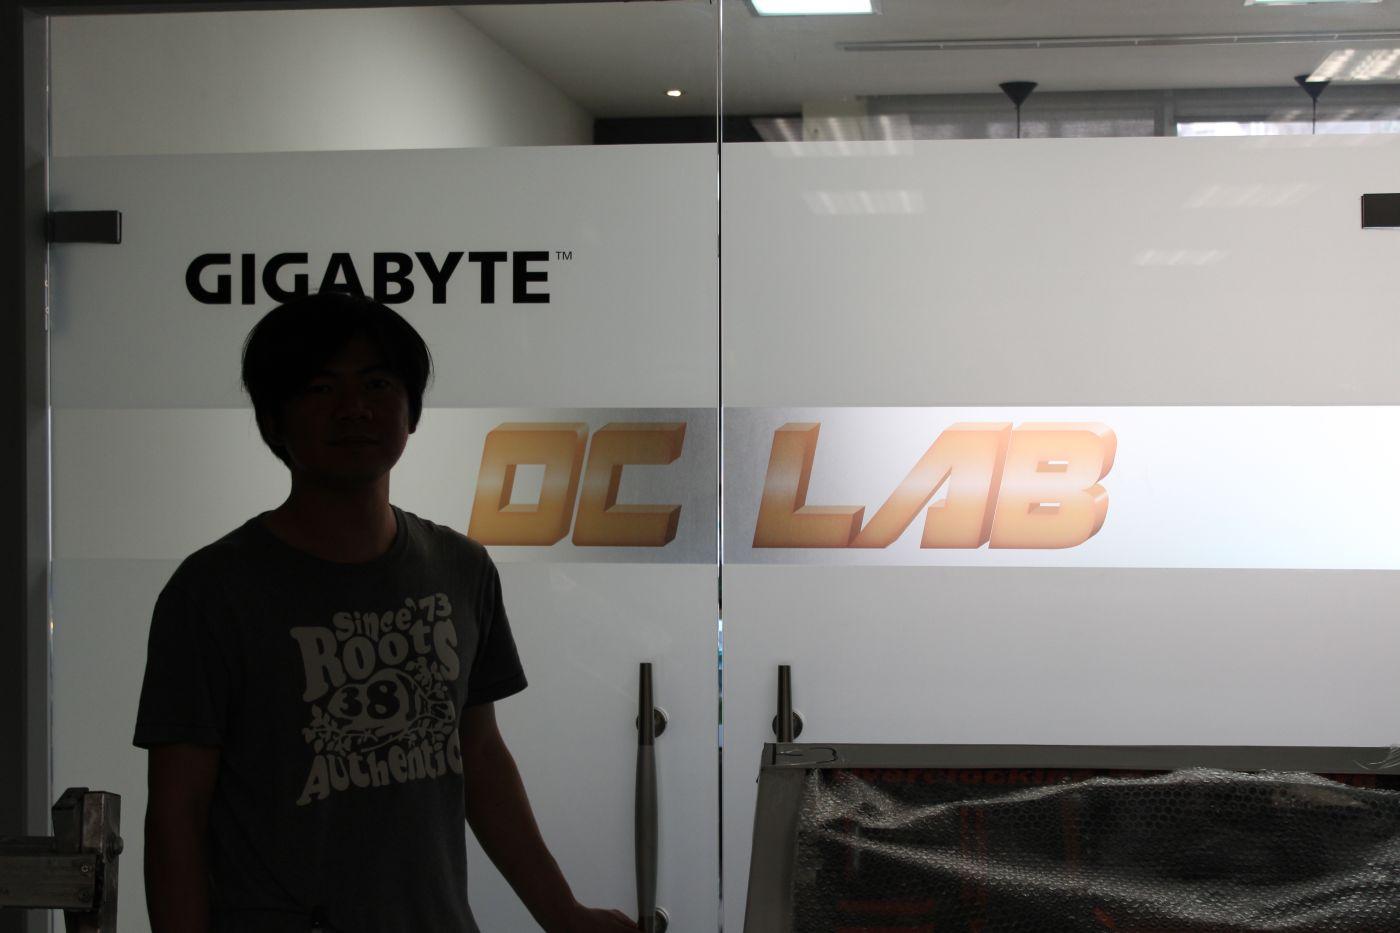 Benchen im GIGABYTE OC-Lab (Computex Taiwan 2013)-img_1772.jpg